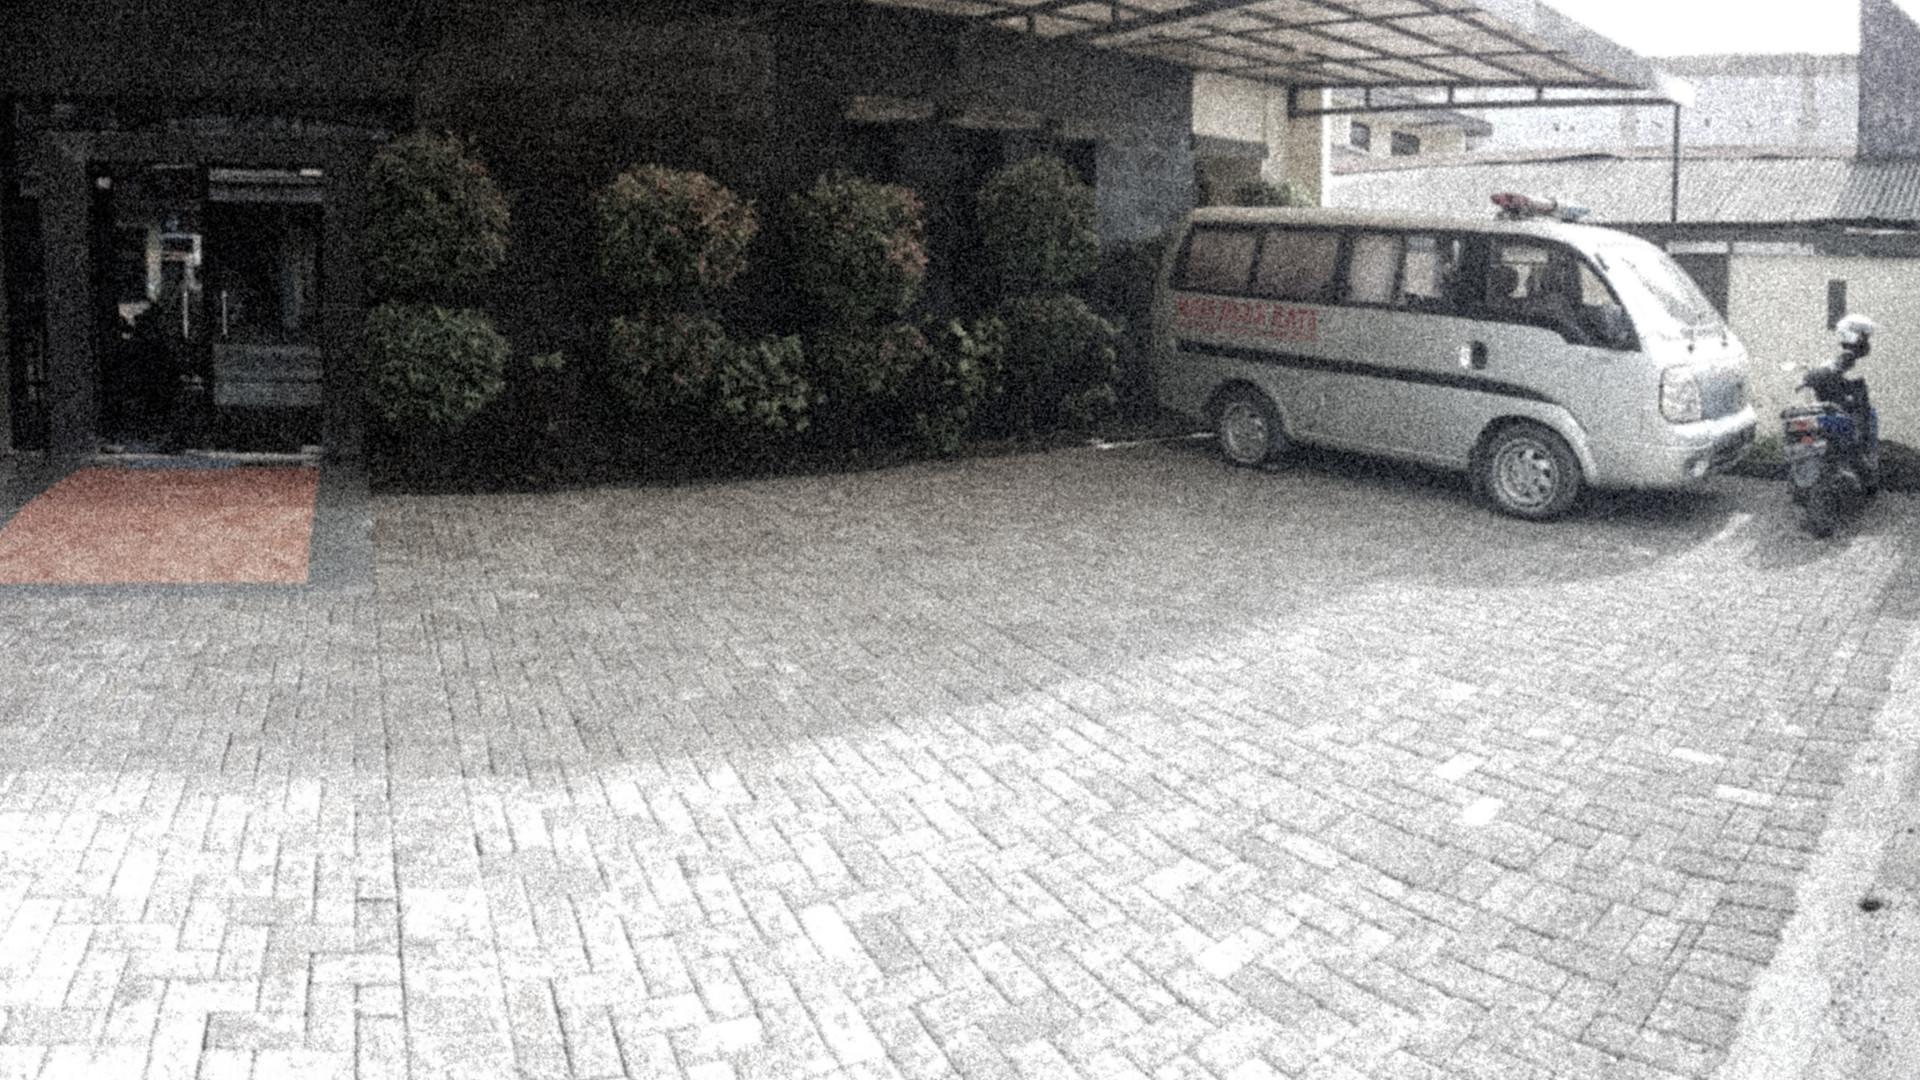 Rumah Sakit, Kabupaten Bandung Barat